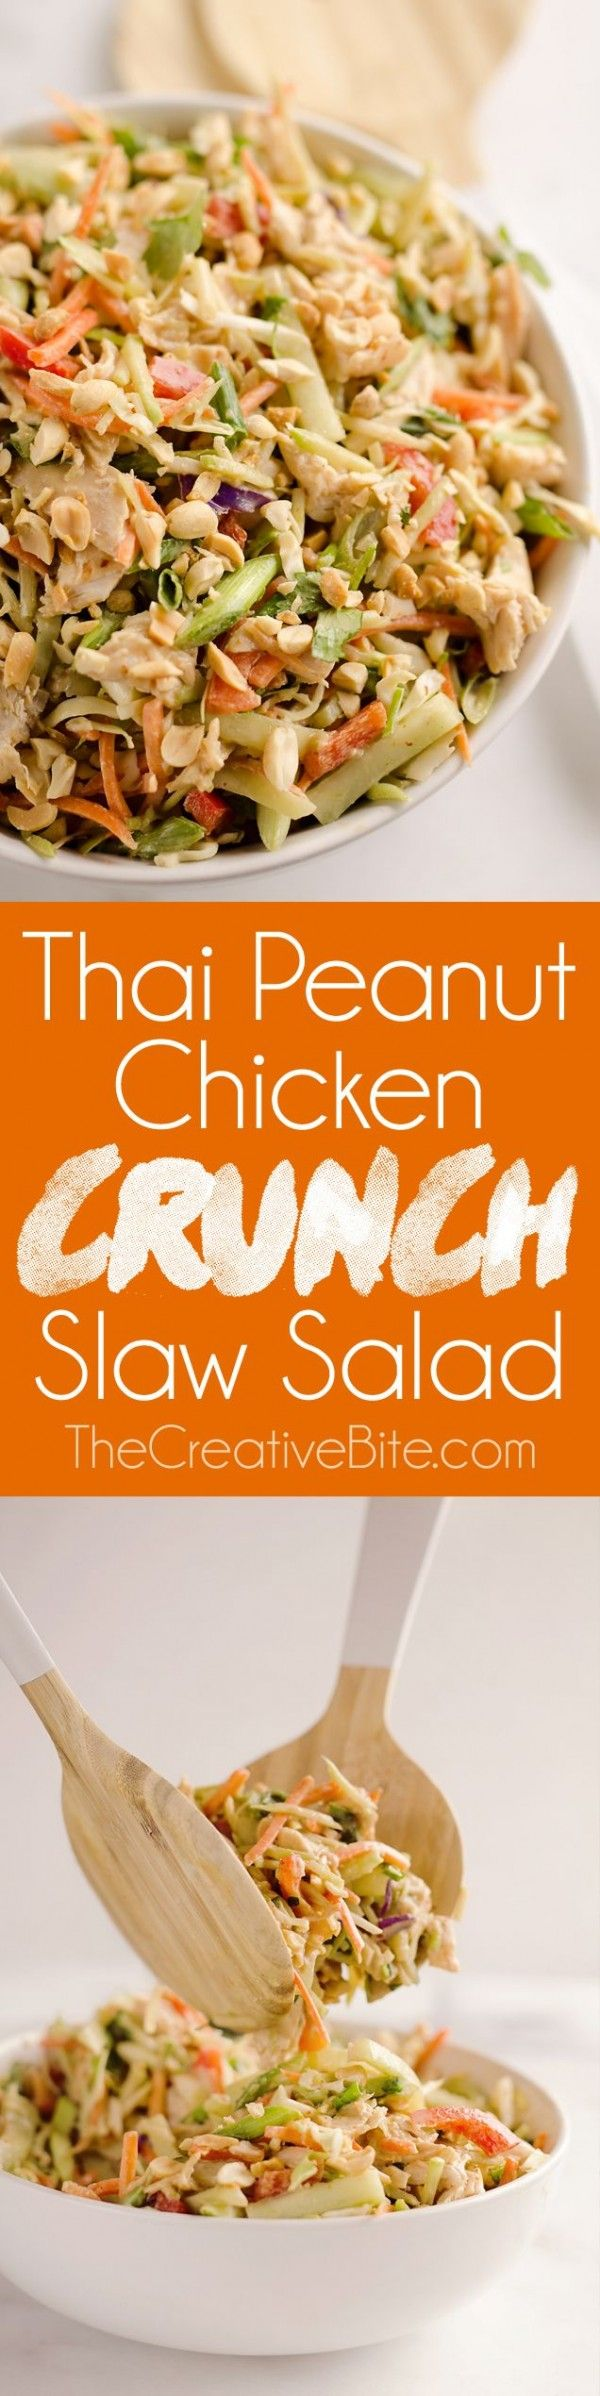 Get the recipe Thai Peanut Chicken Crunch Slaw Salad @recipes_to_go